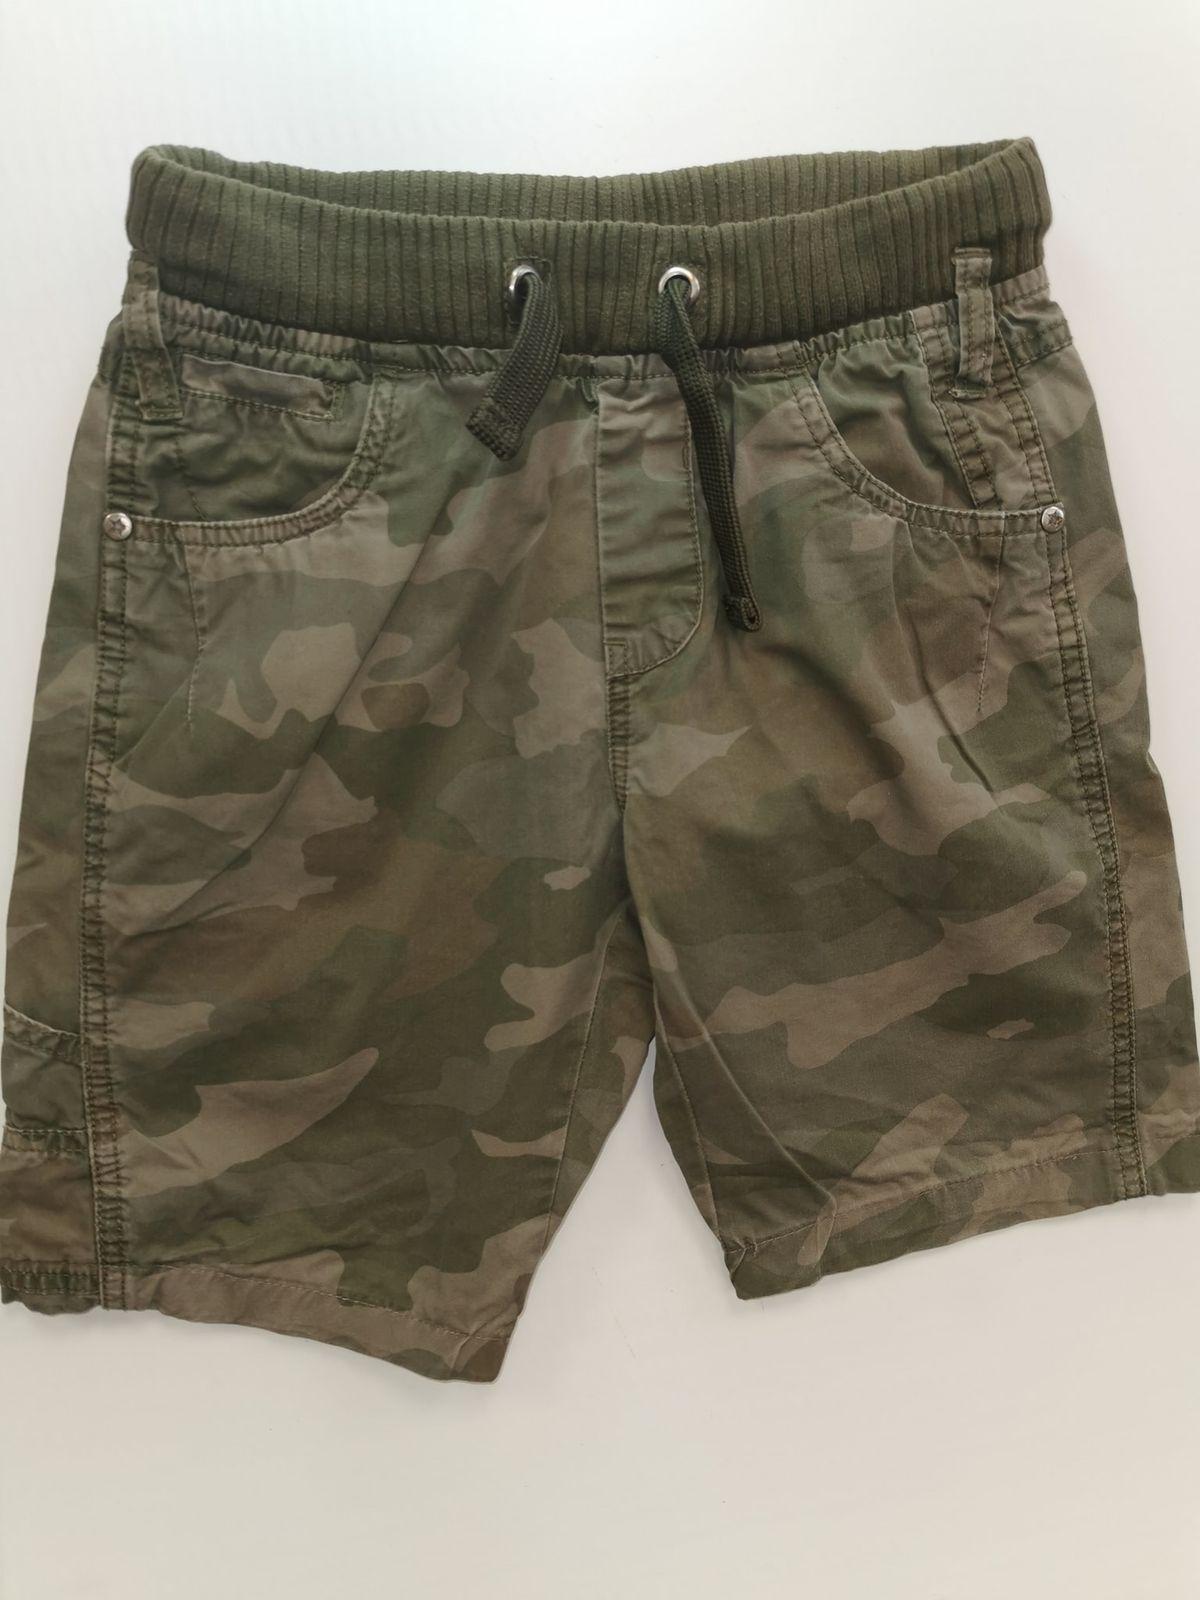 11/12 anni. 130390 Pantaloni militari con coulisse € 7.00